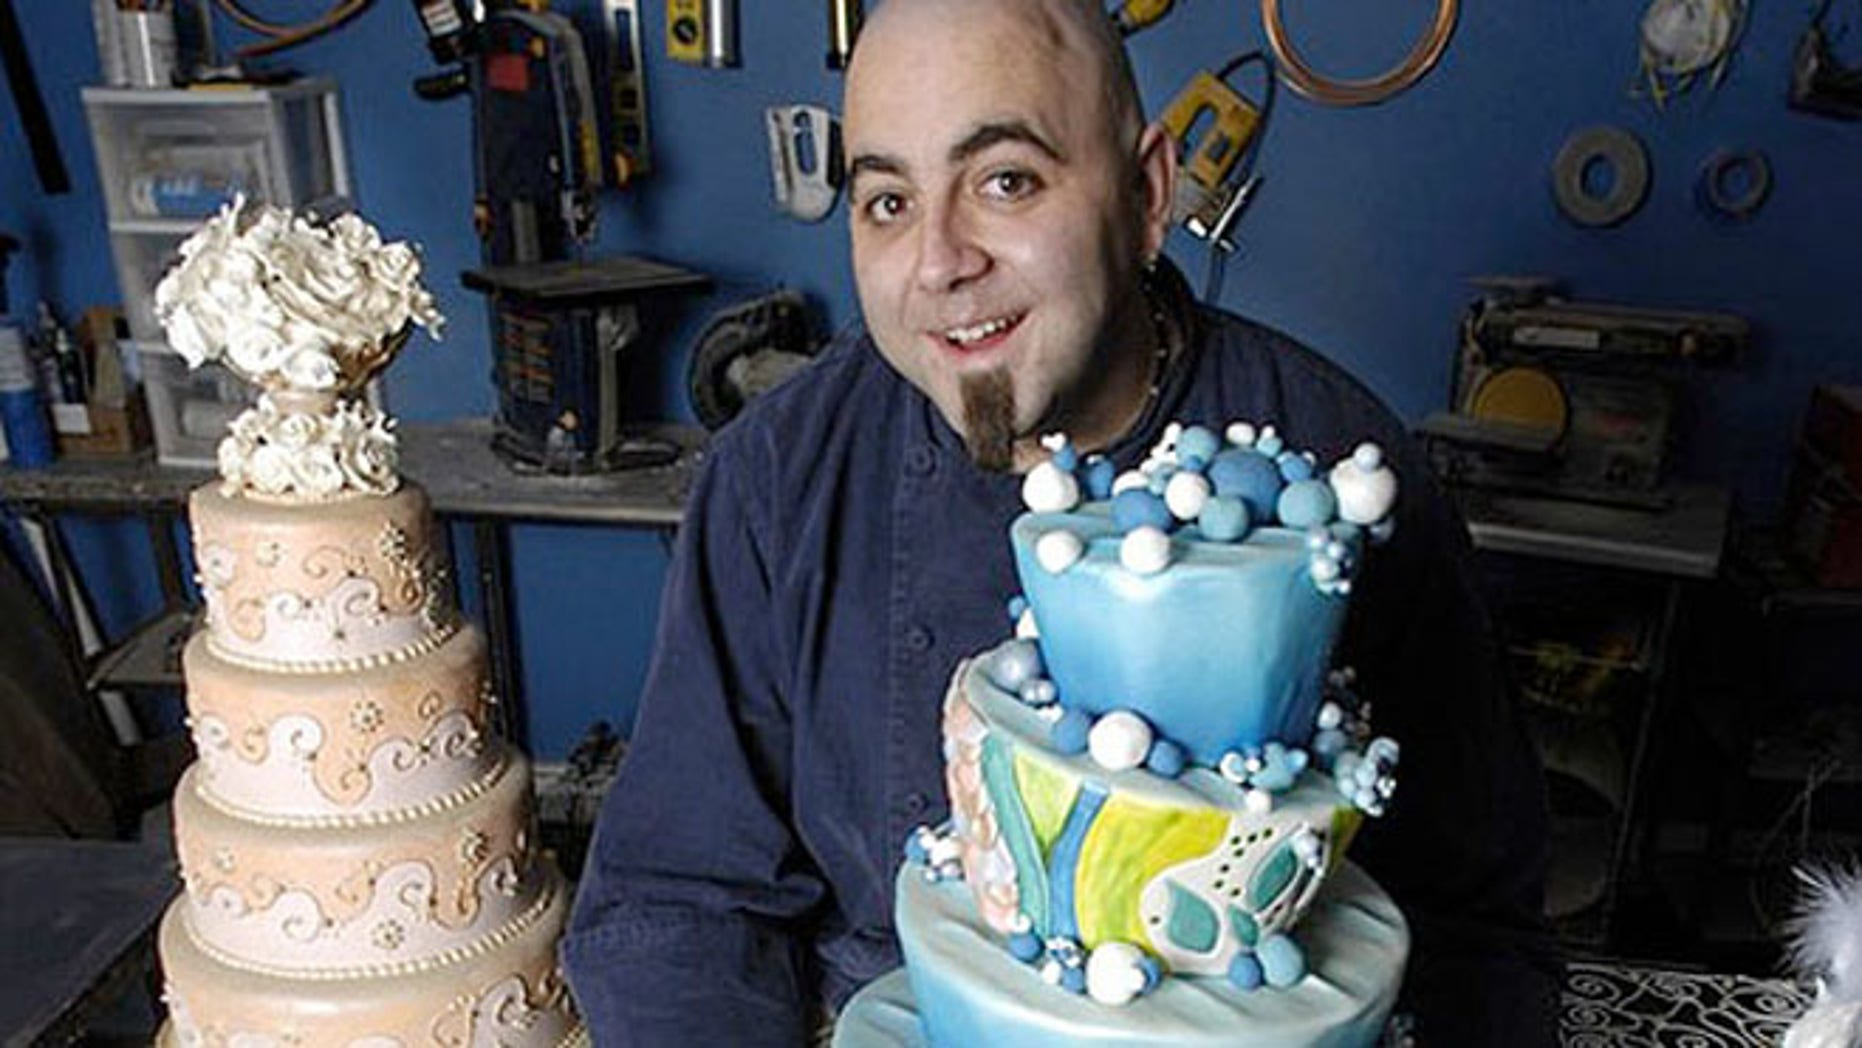 Baltimore celebrity baker Duff Goldman and Charm City Cakes owner is baking for President Barack Obama's inaugural ball.